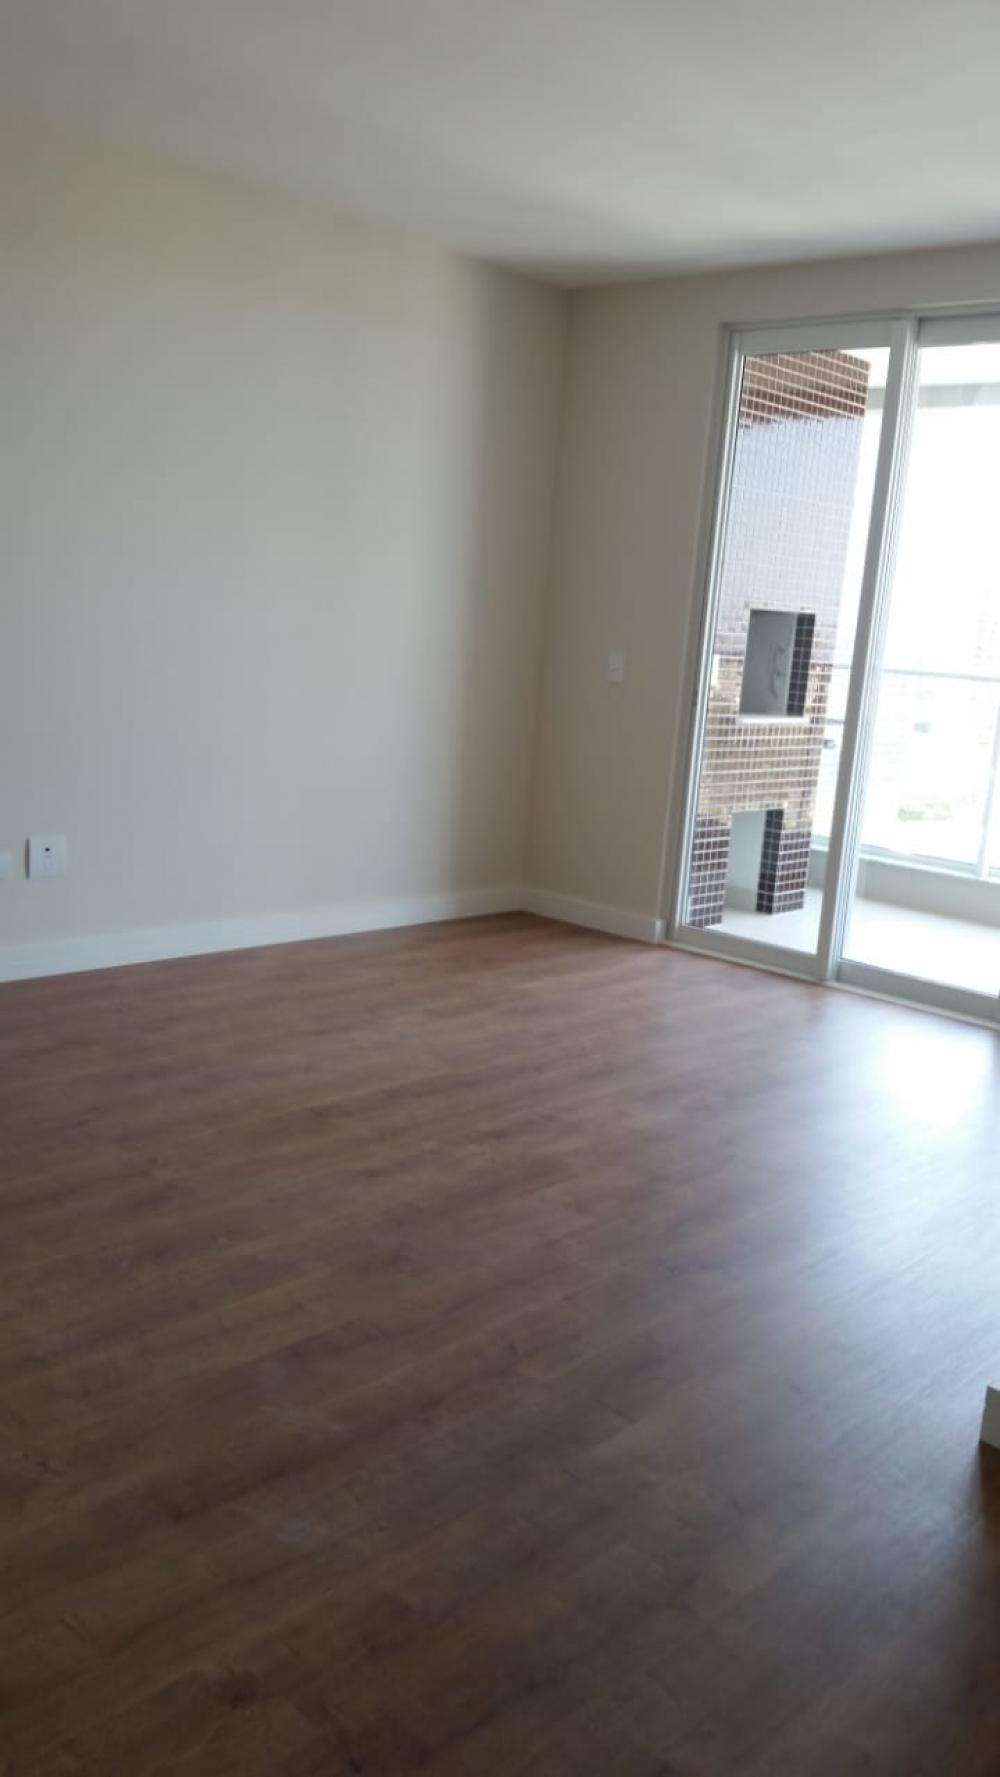 Maringa Apartamento Venda R$650.000,00 Condominio R$500,00 3 Dormitorios 1 Suite Area construida 101.00m2